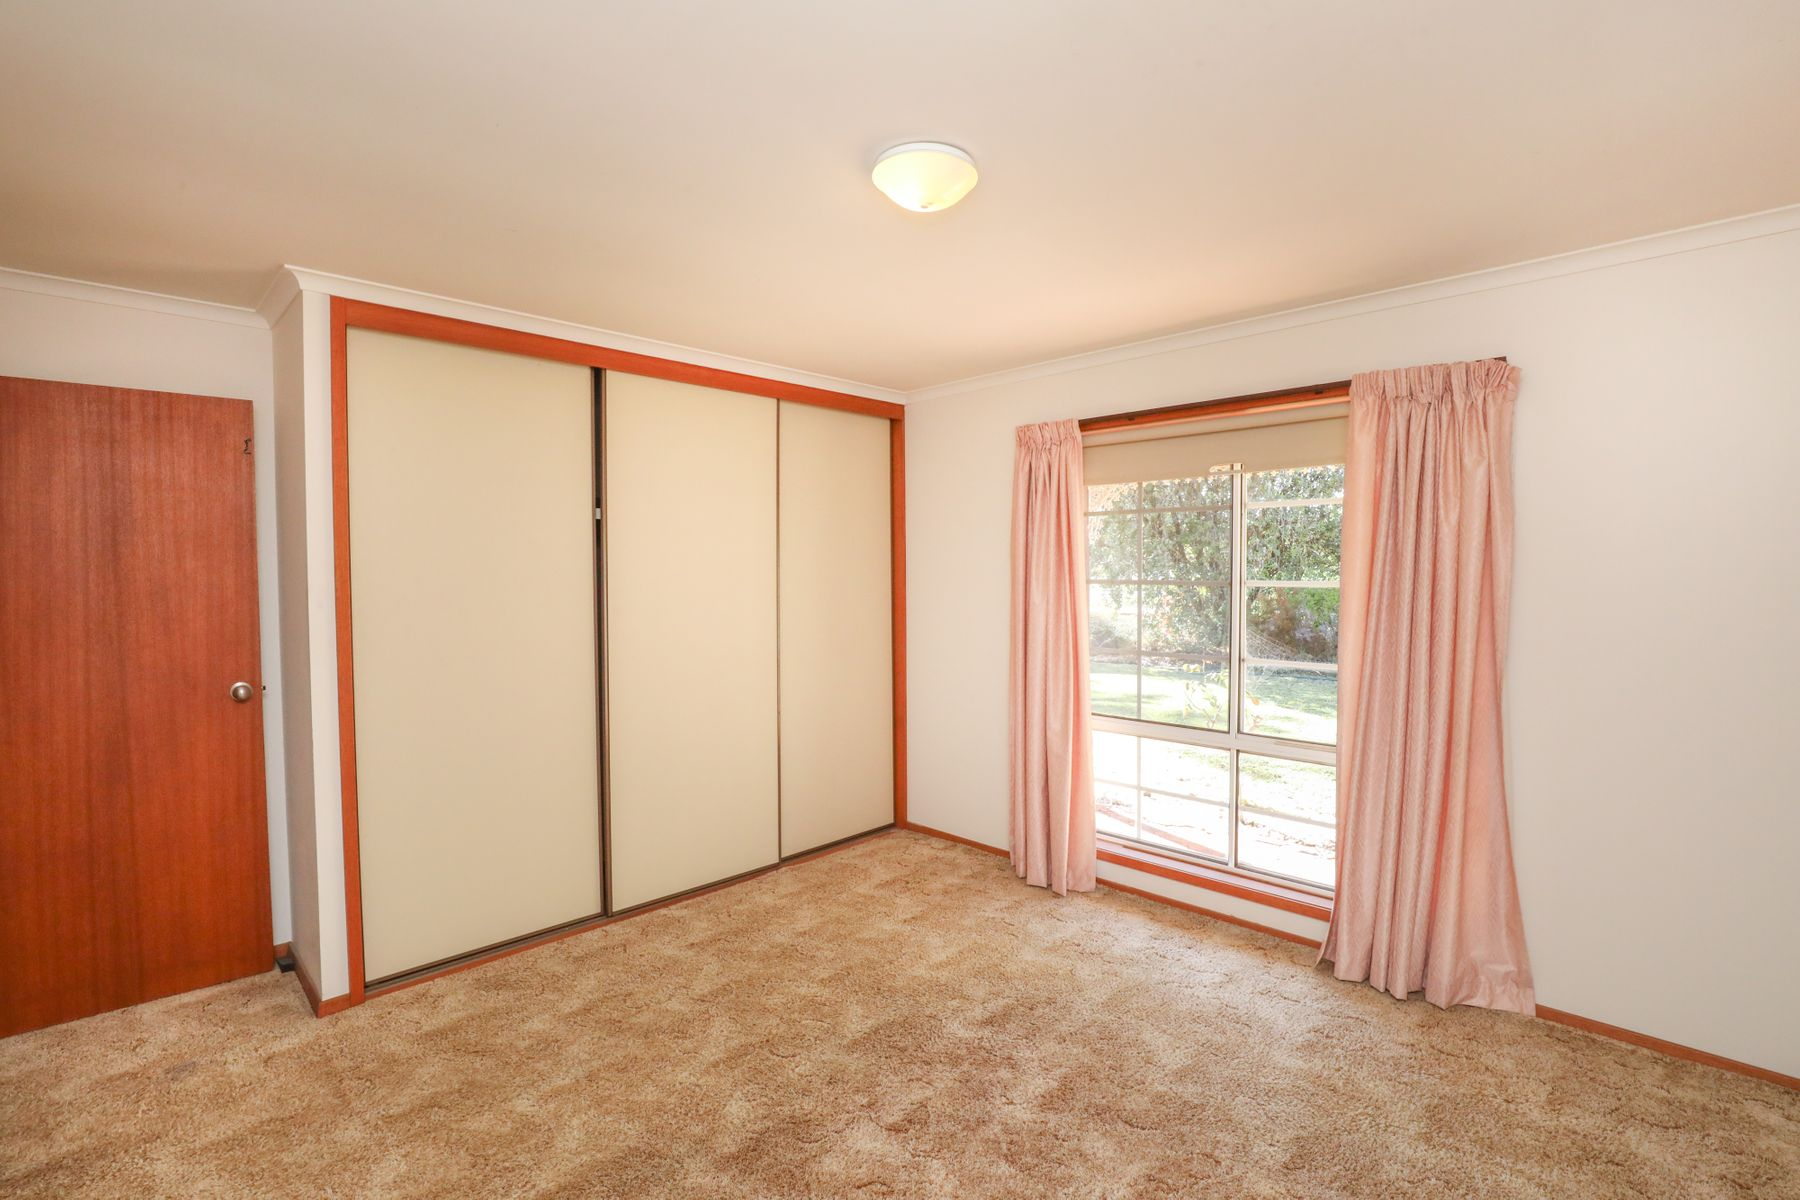 497 San Mateo Avenue, Mildura, VIC 3500